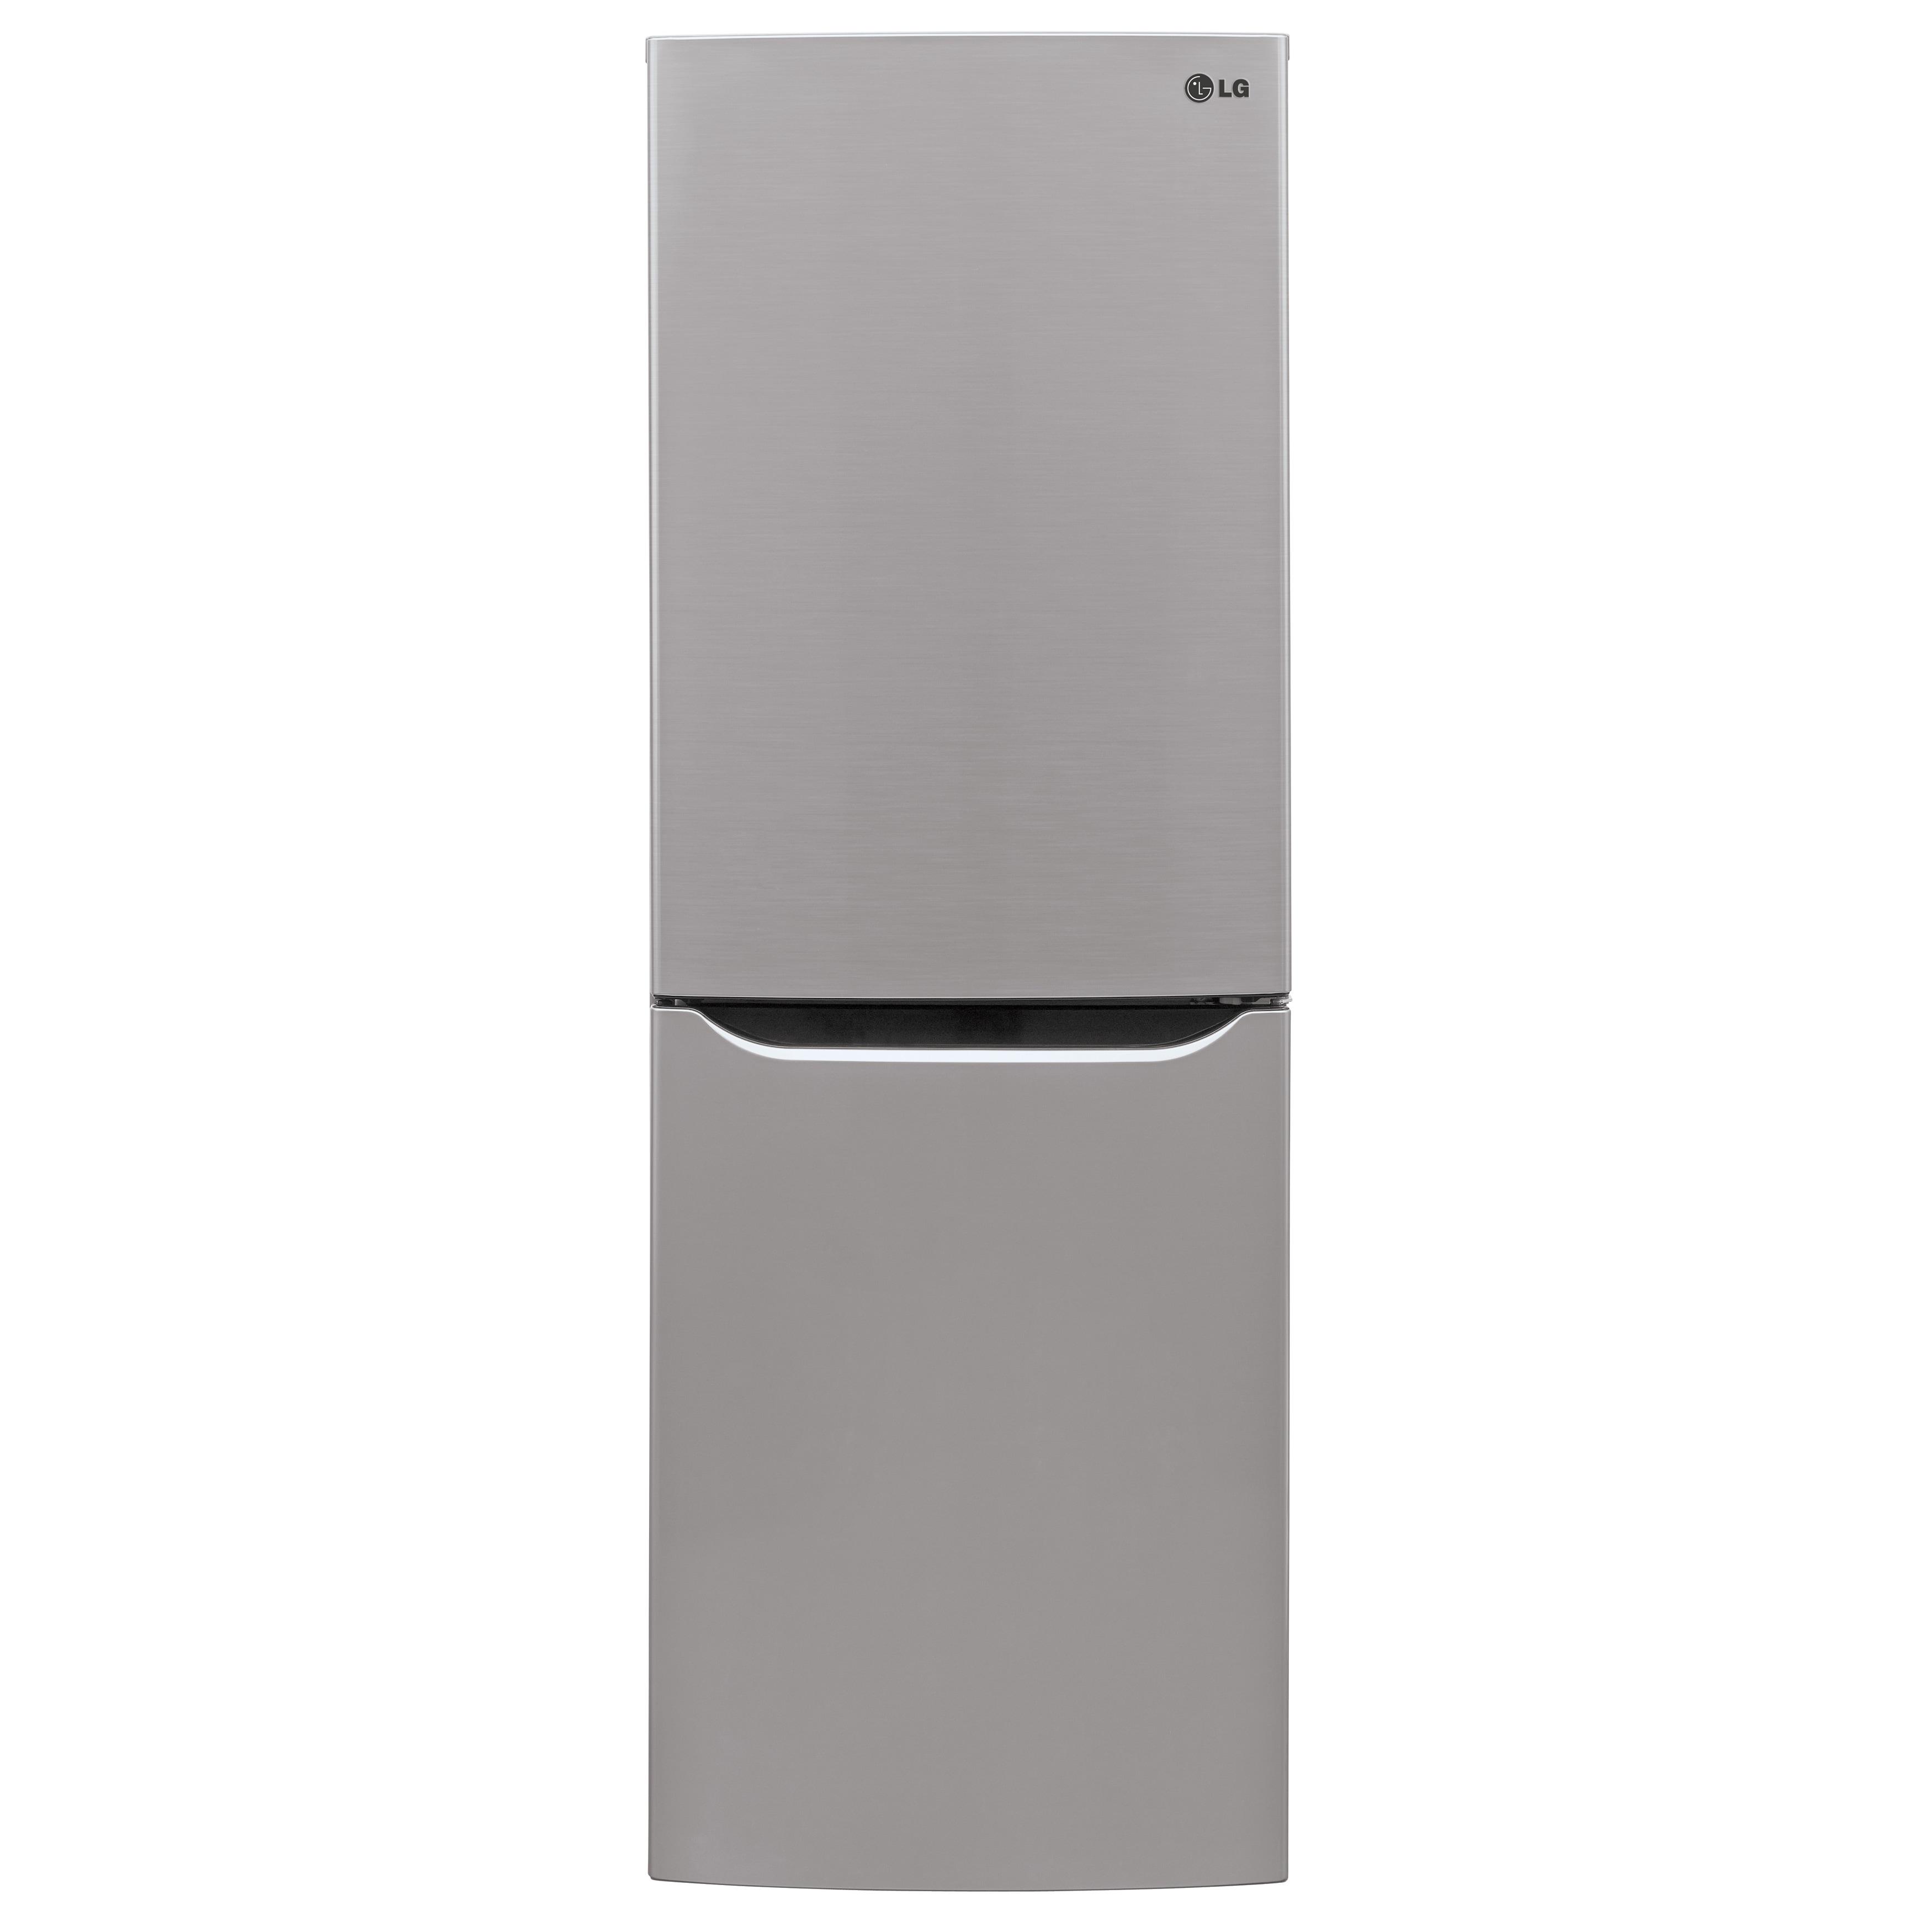 LG LBN10551PS Large Capacity 2 Door Bottom-Mount Refriger...